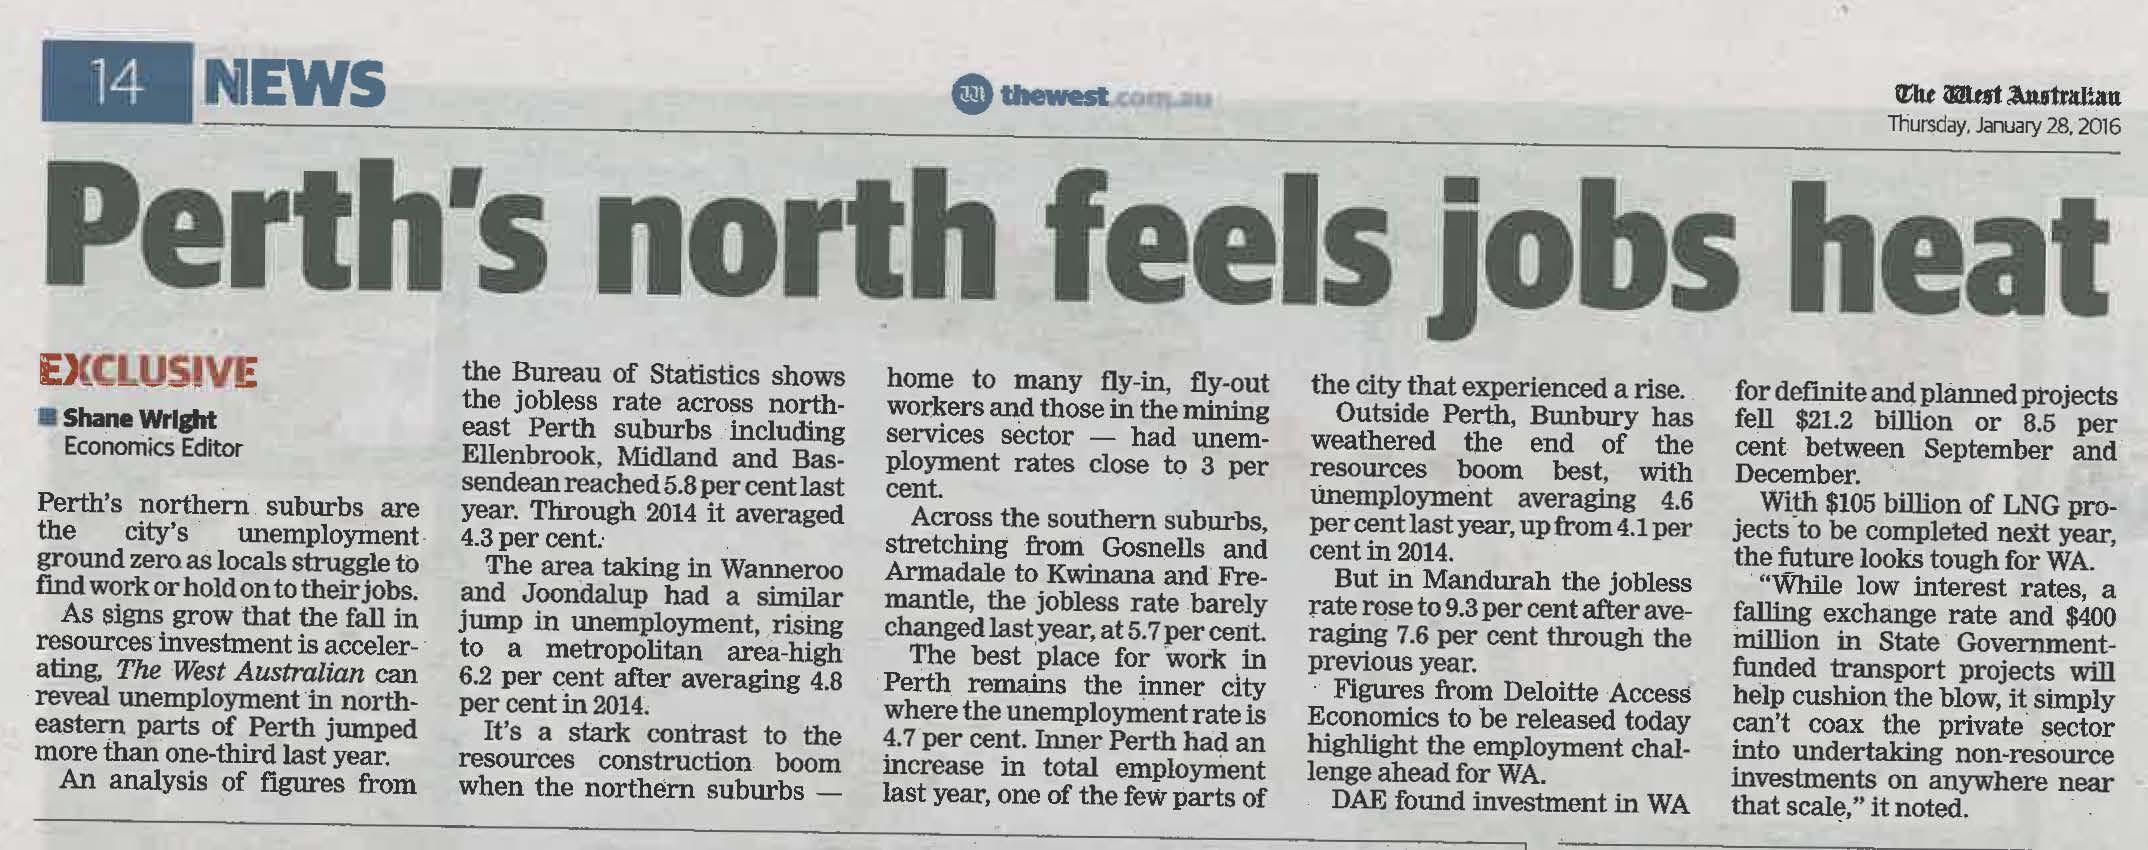 The_West_Perth_North_feels_job_heat_28012016.jpg